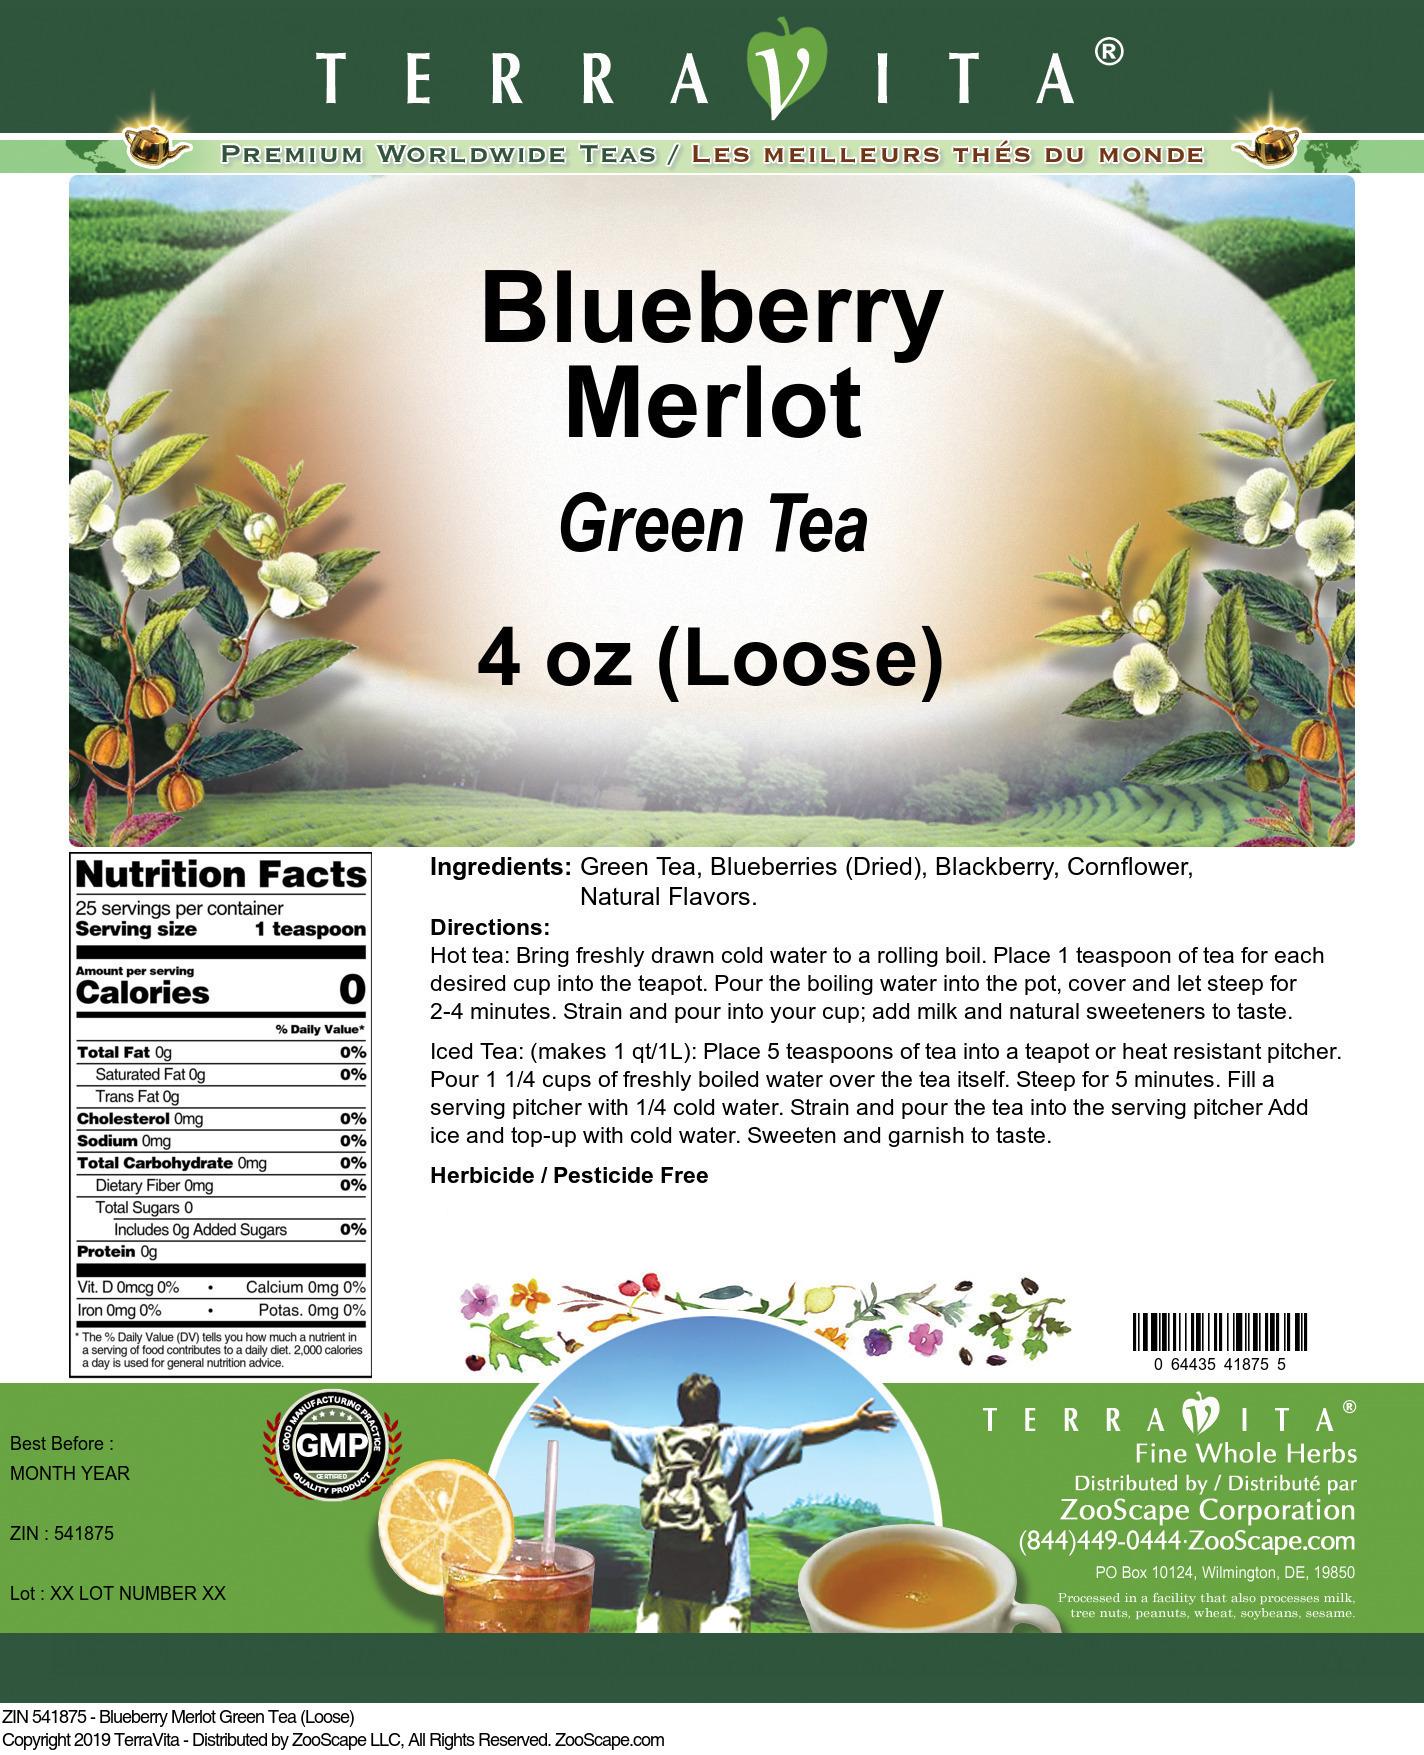 Blueberry Merlot Green Tea (Loose)